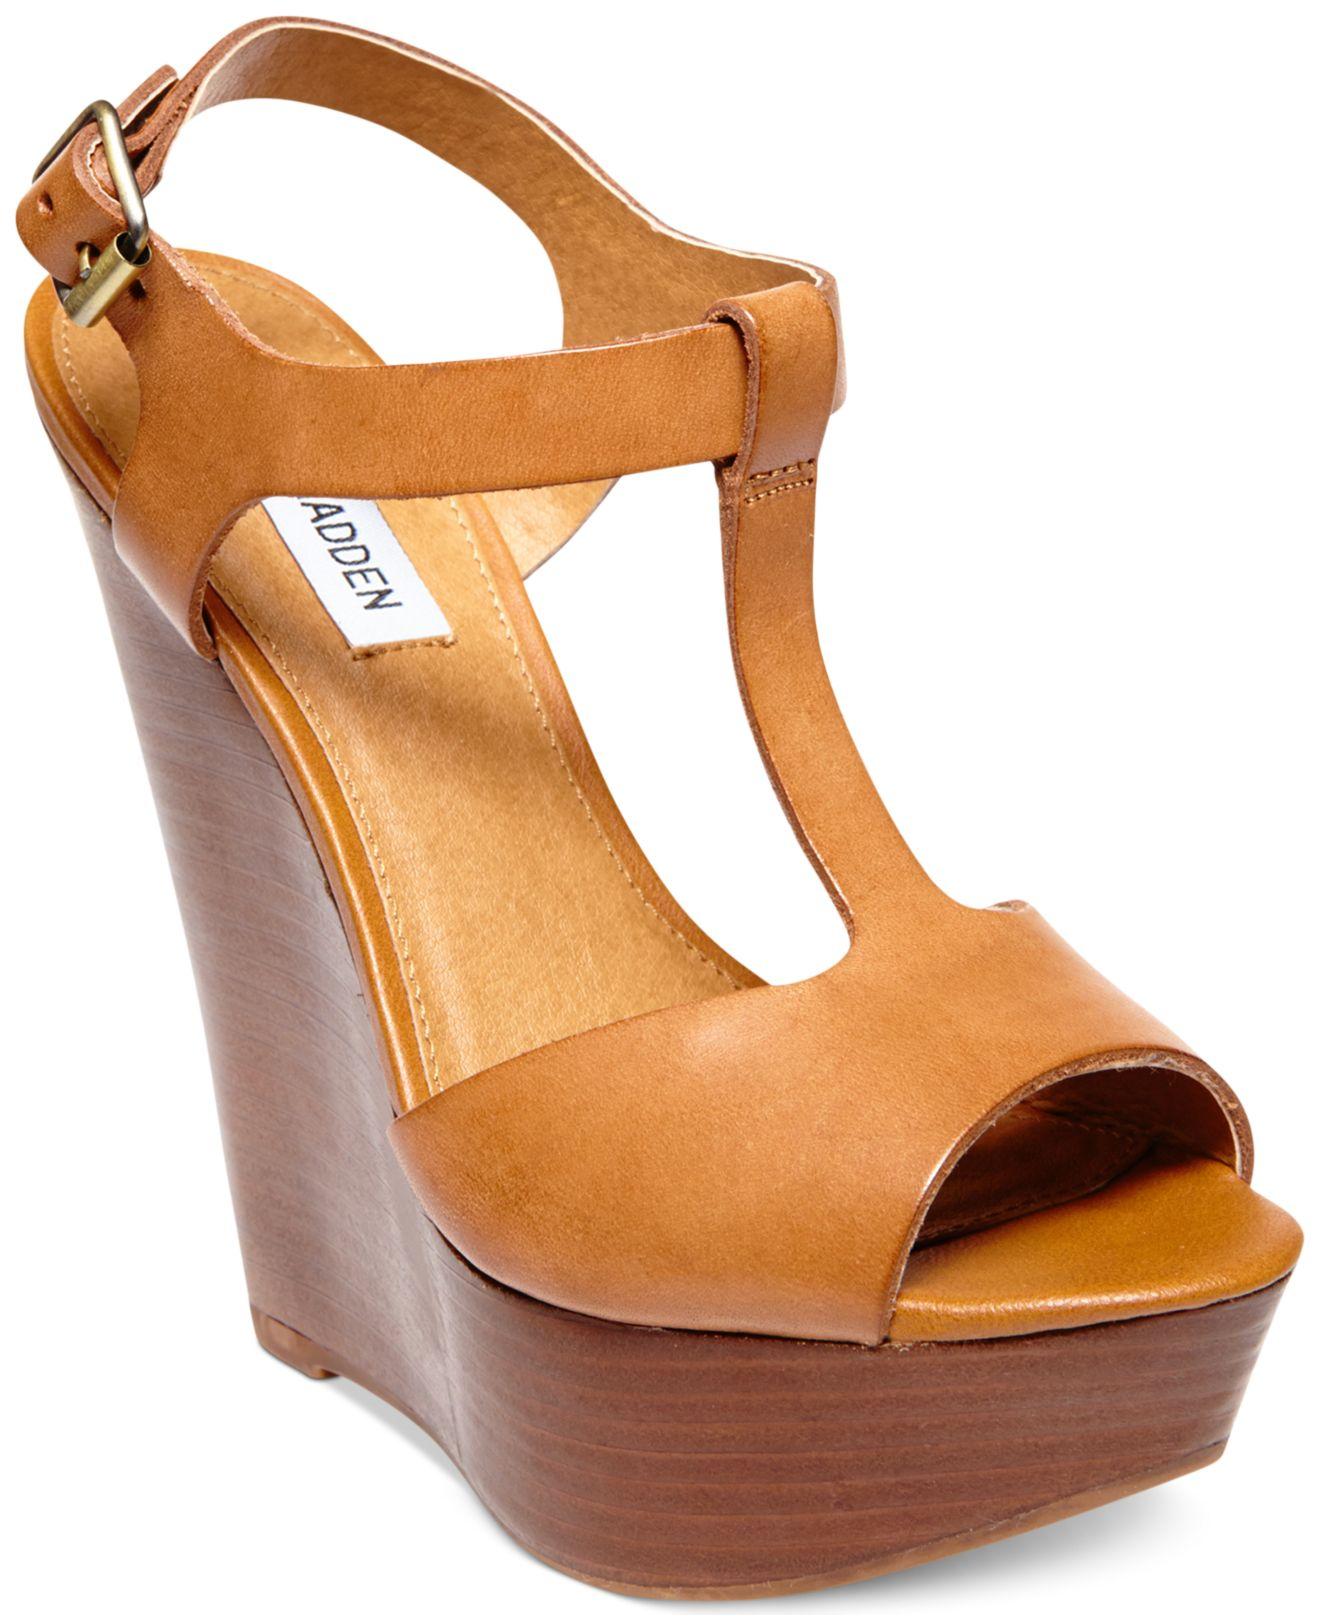 f518021caac Steve Madden Orange Women'S Bittles Platform Wedge Sandals